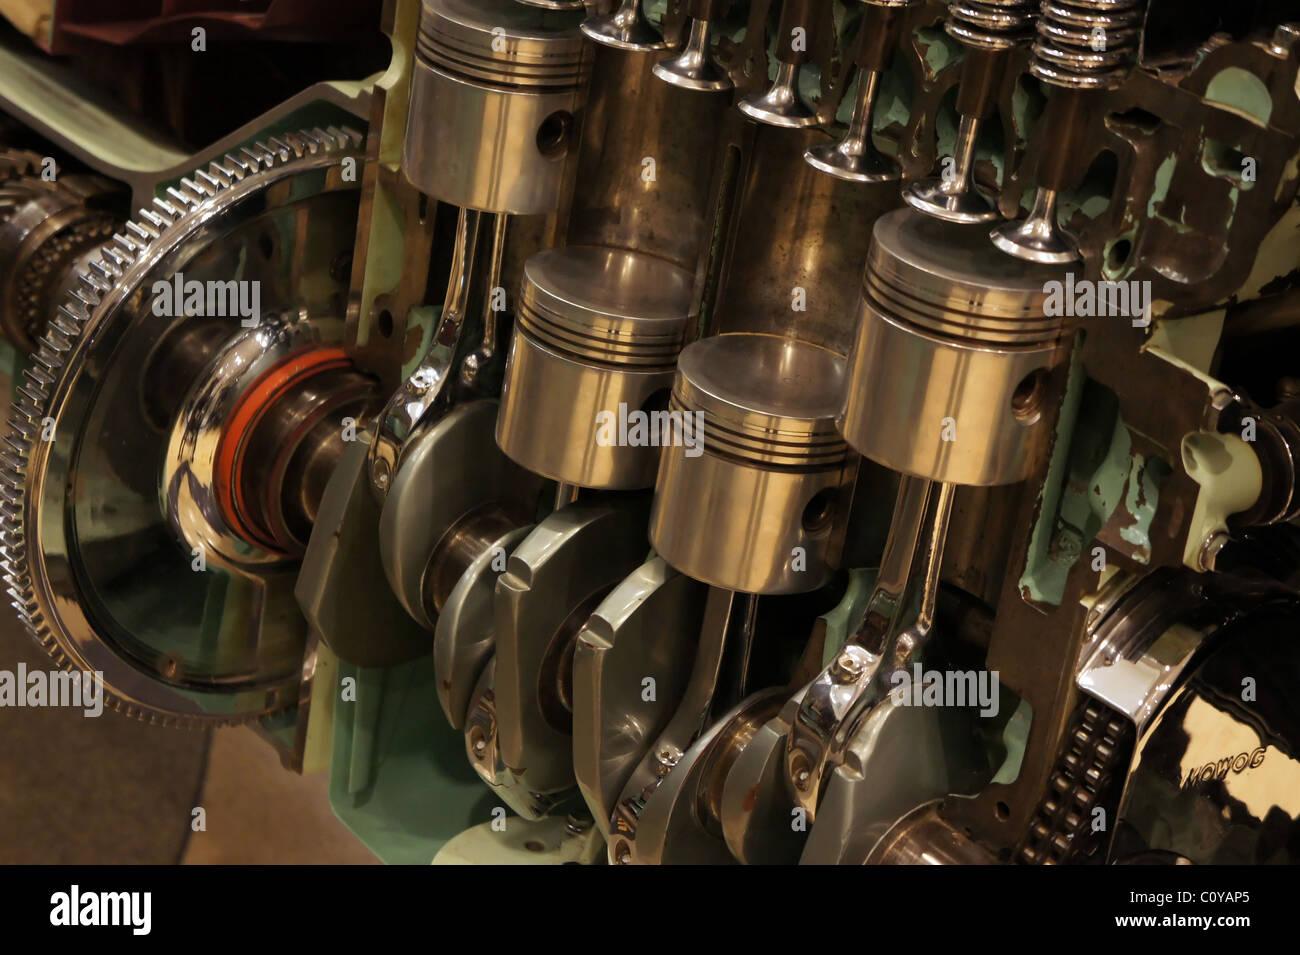 Internal Combustion Engine Stock Photos Block Diagram Cut Away 4 Cylinder Image